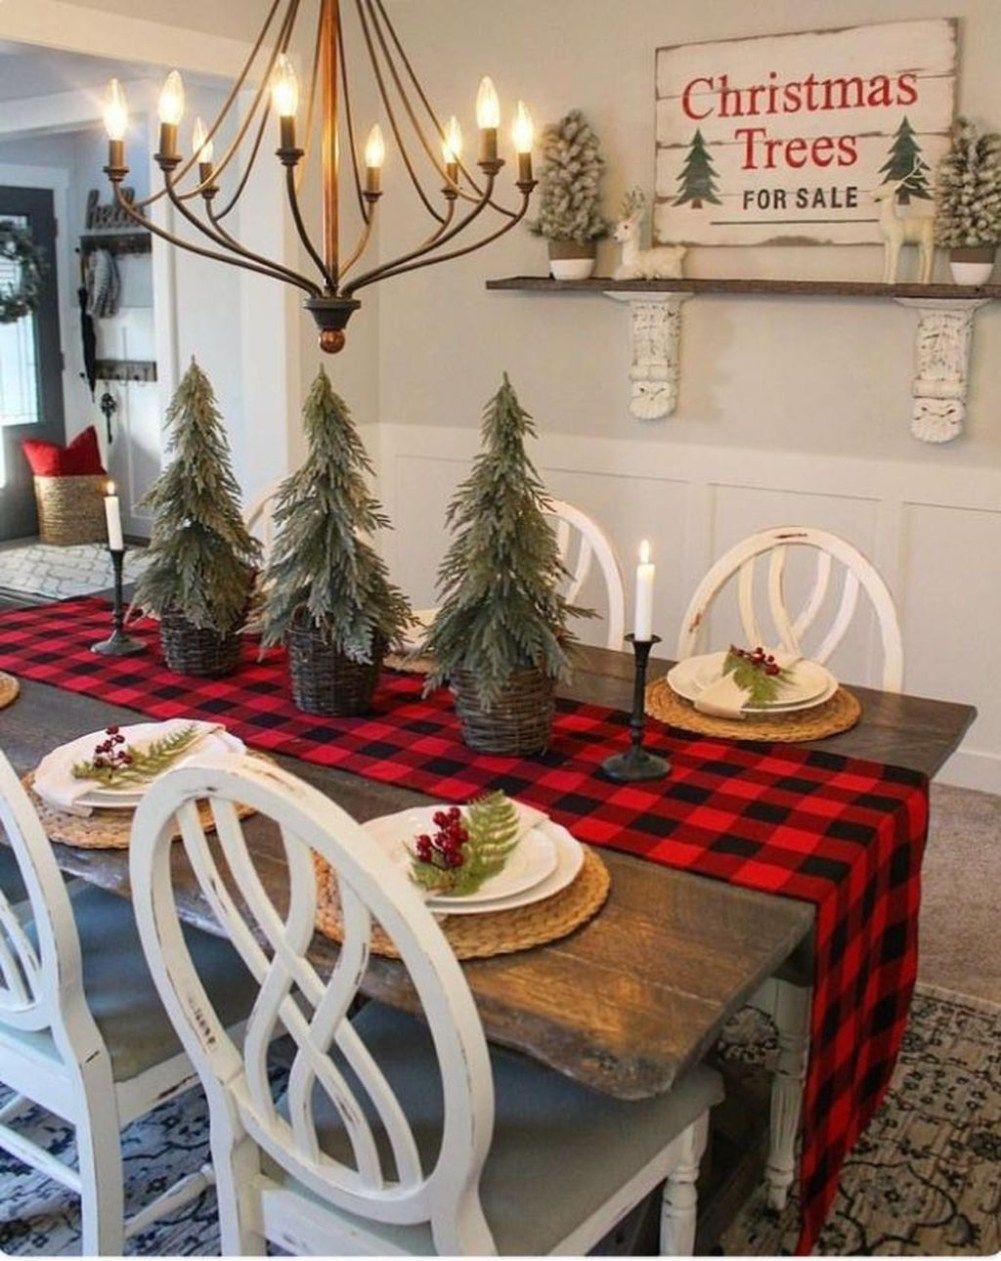 44 Stunning Christmas Decor Ideas With Farmhouse Style For Living Room Trendehouse Christmas Decorations Farmhouse Christmas Decor Holiday Decor